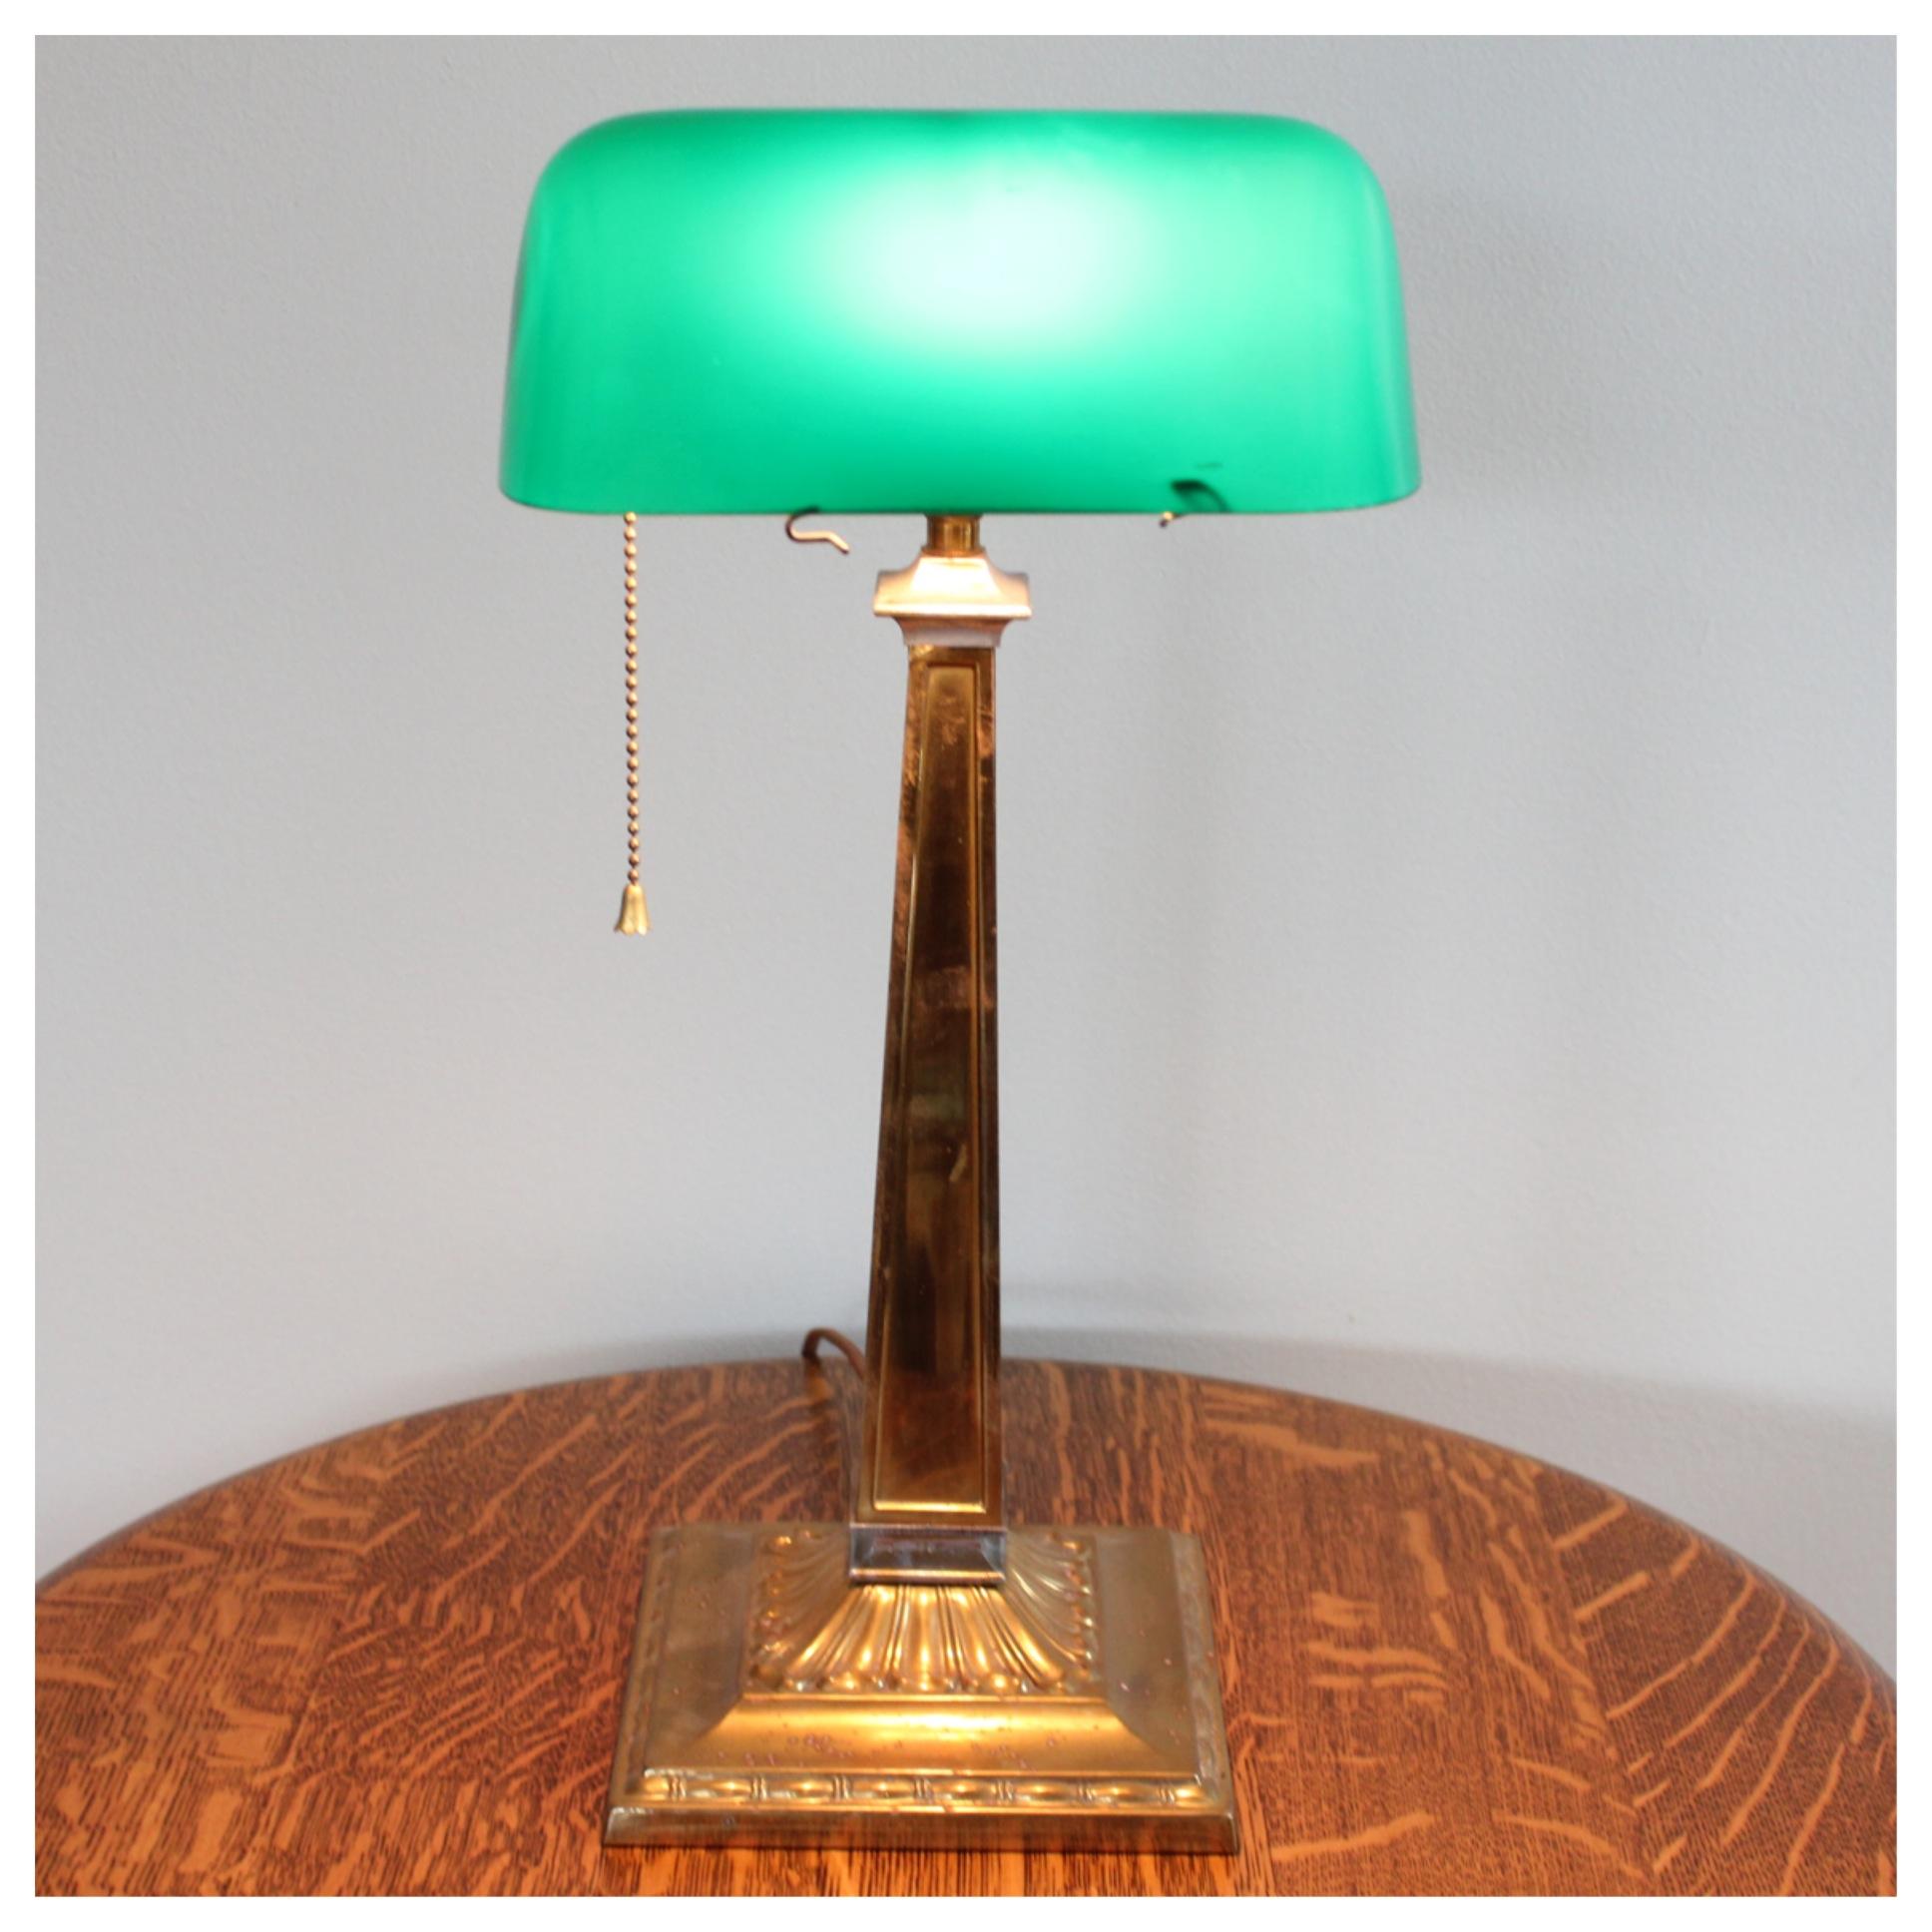 A1492 Emeralite Desk Lamp | Bogart, Bremmer & Bradley Antiques